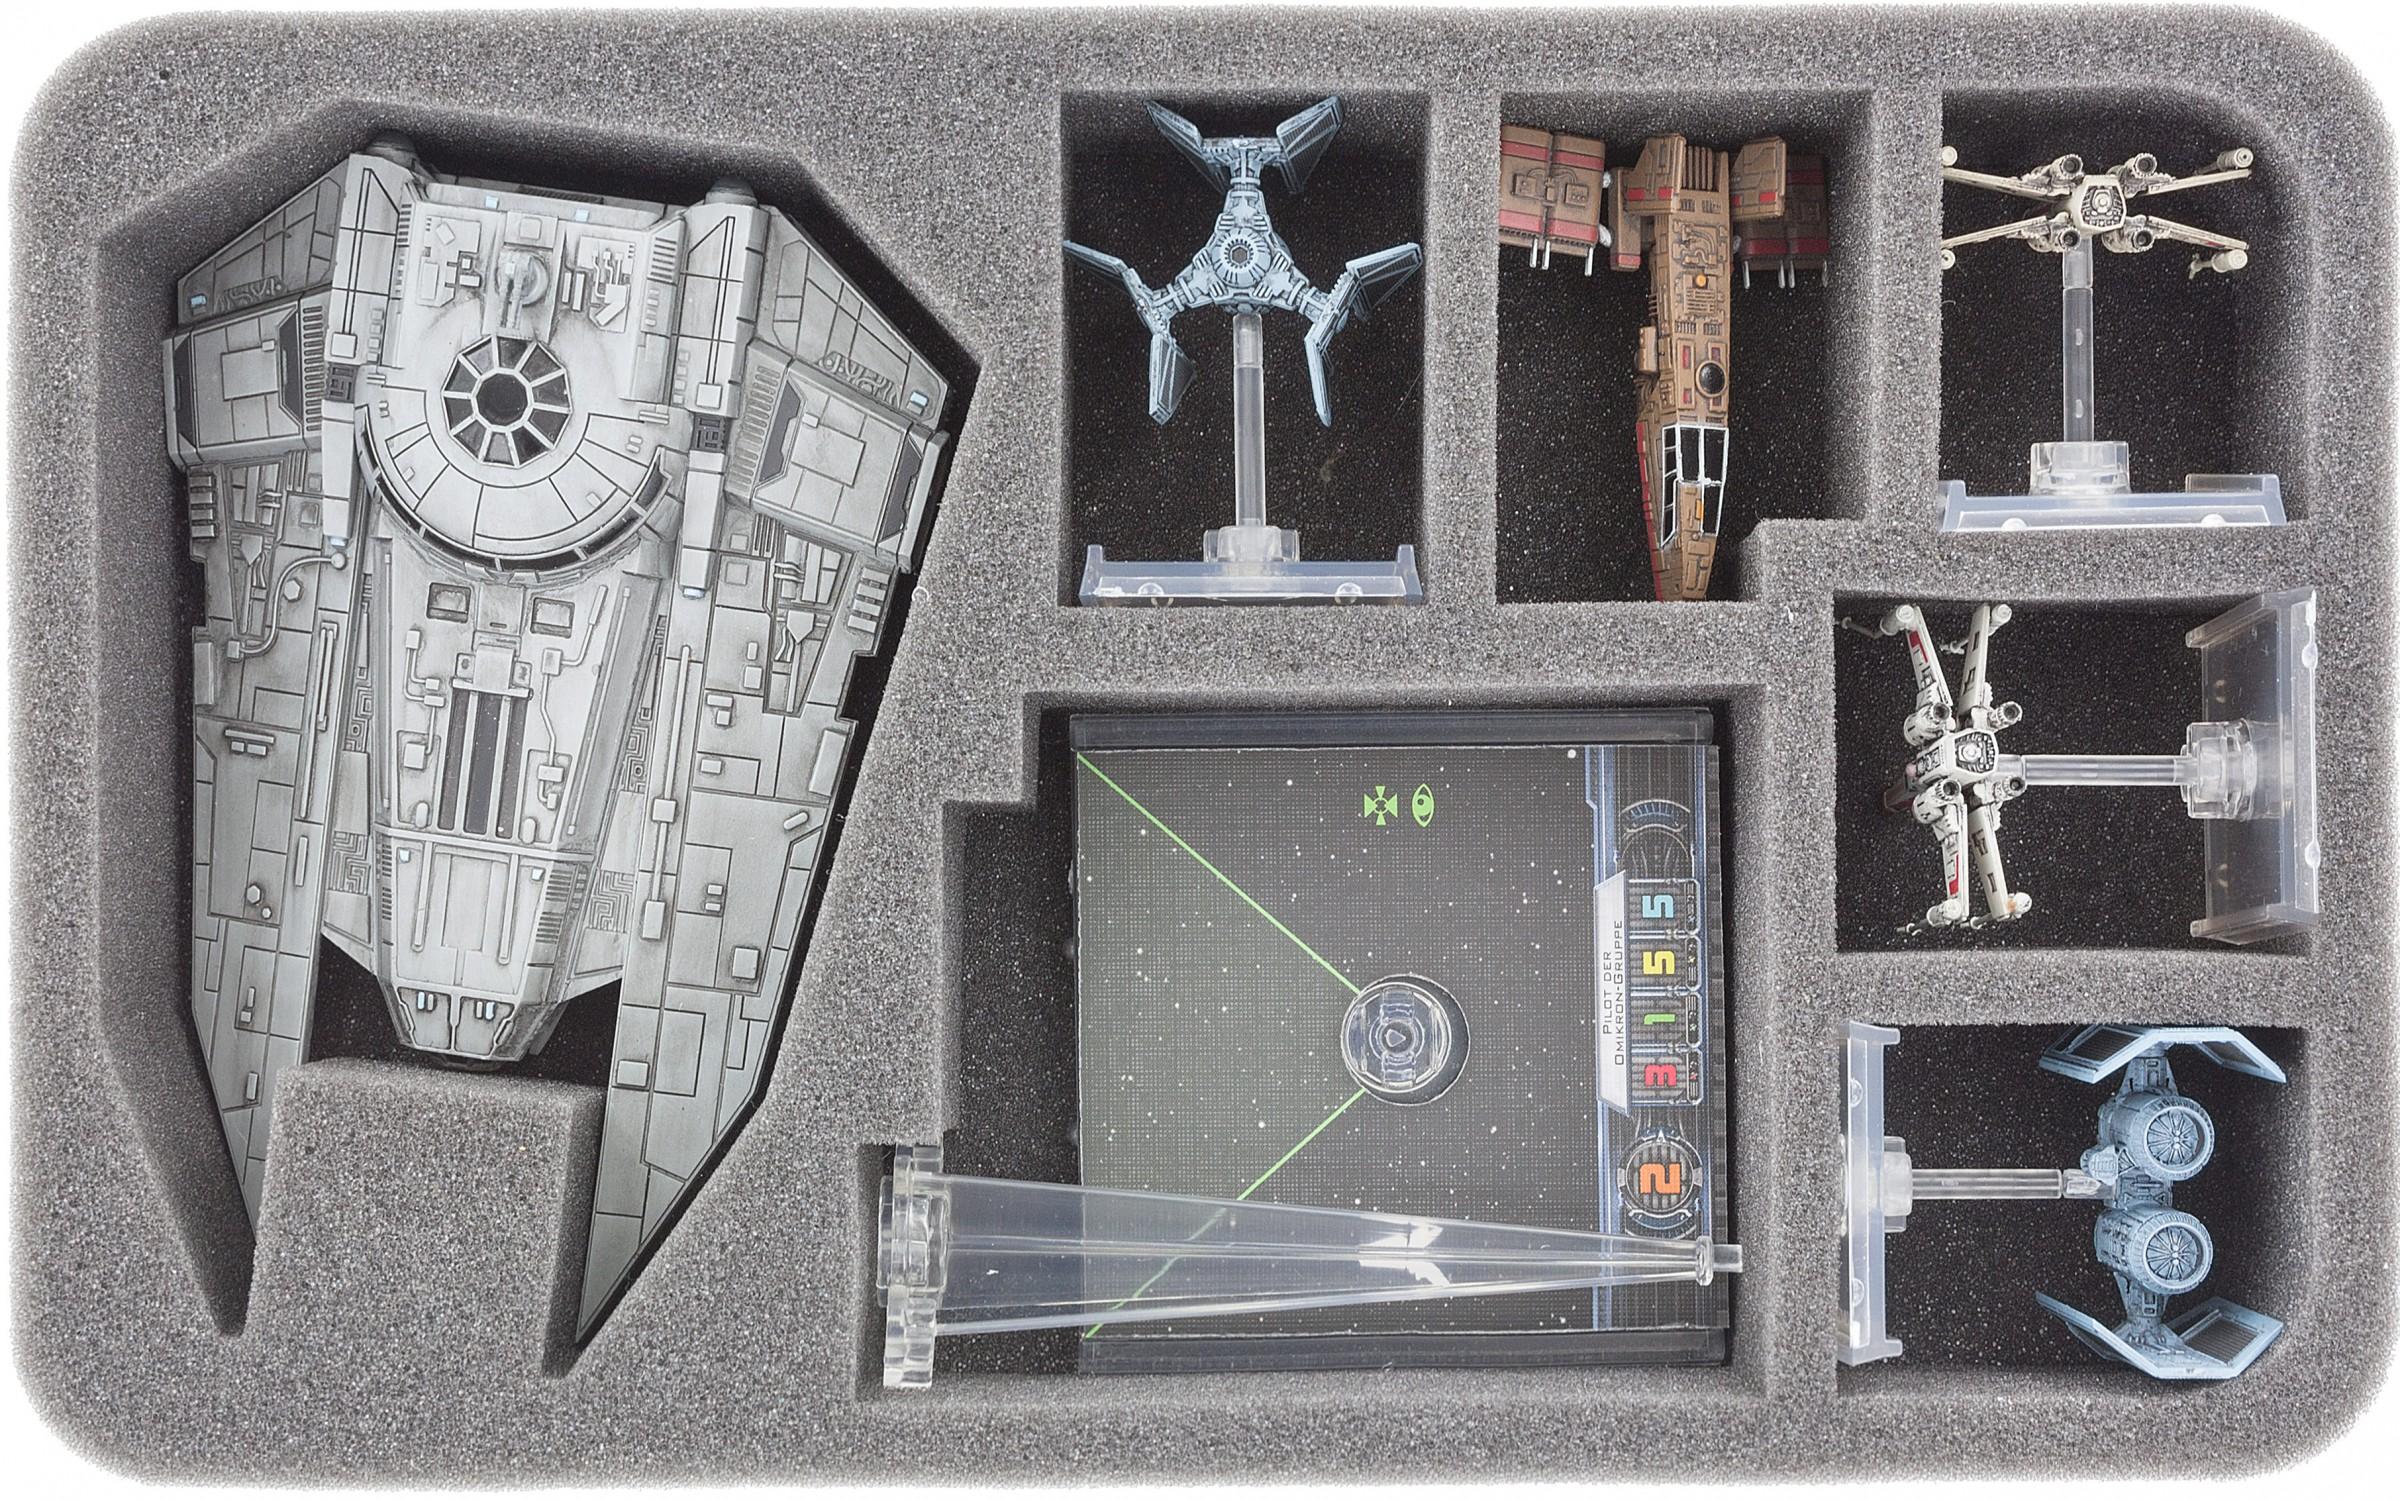 HSBK050BO foam tray for Star Wars X-WING VT-49 Decimator   Feldherr  Worldwide